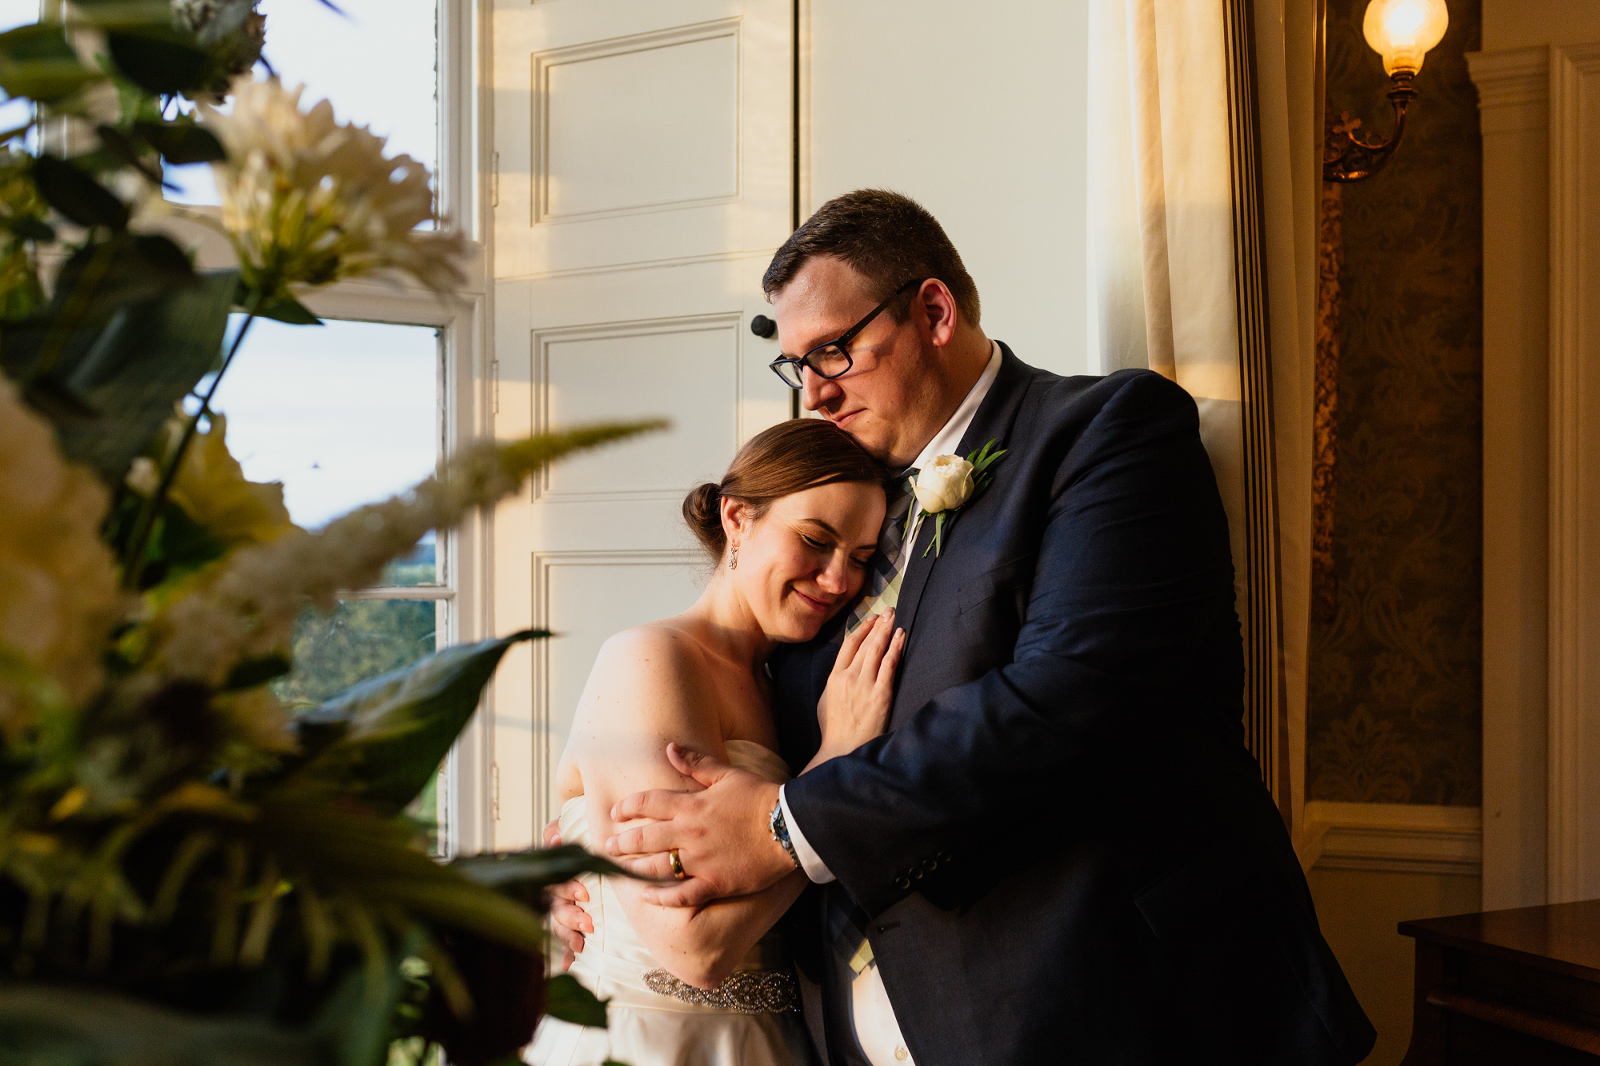 bride-groom-standing-in-golden-light-at-blairquhan-castle